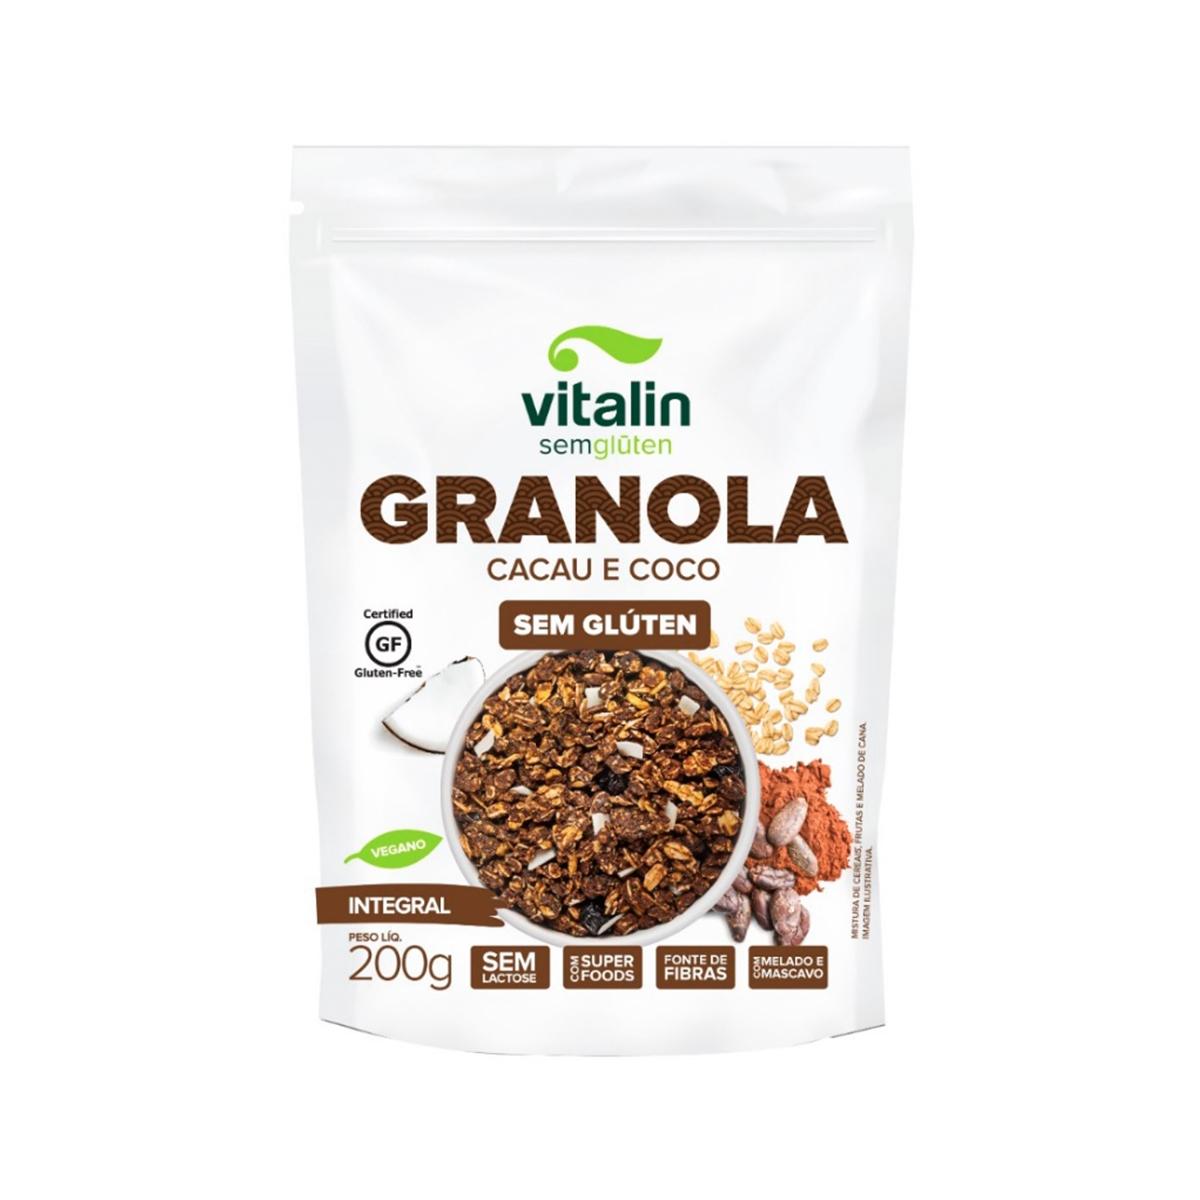 Granola Sem Glúten Cacau e Coco 200g - Vitalin